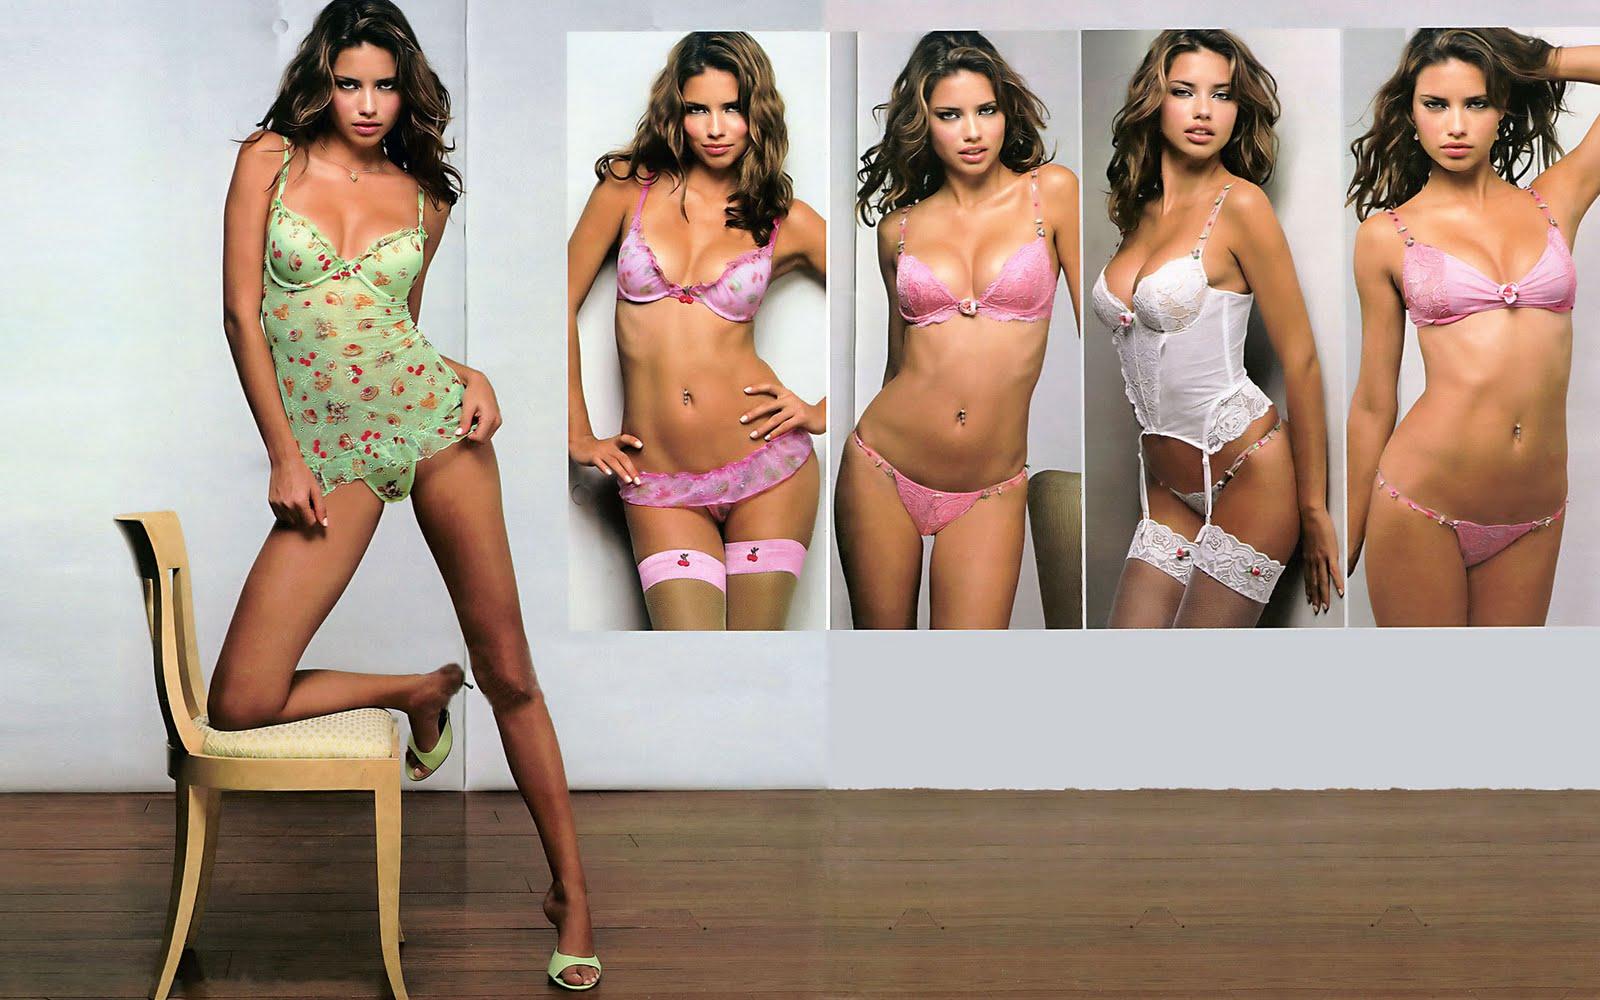 http://2.bp.blogspot.com/_W40QLPbCeXw/TRynbNAv0xI/AAAAAAAAC2M/j9yv43sz8vA/s1600/Desktop+Women+-+HQ+Wallpaper+239+-+adriana_lima.jpg